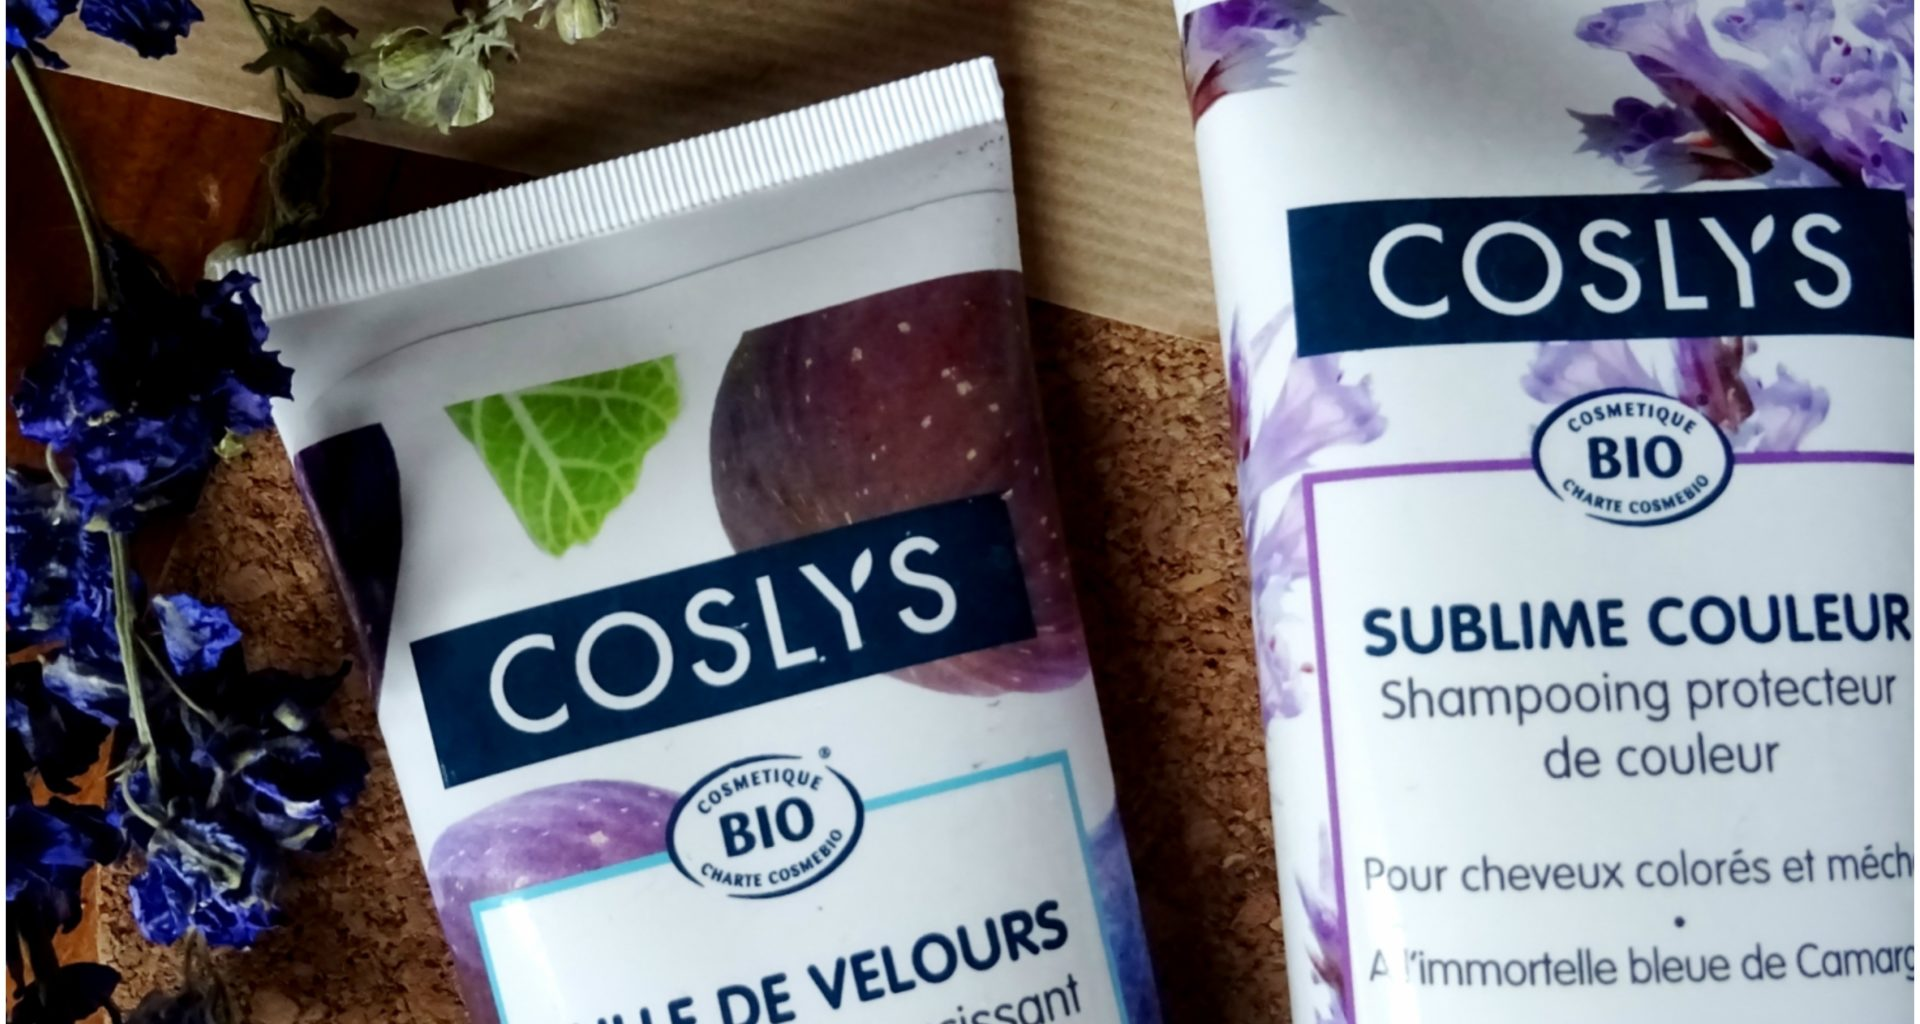 coslys-bio-vegan-shampoing-gel-douche